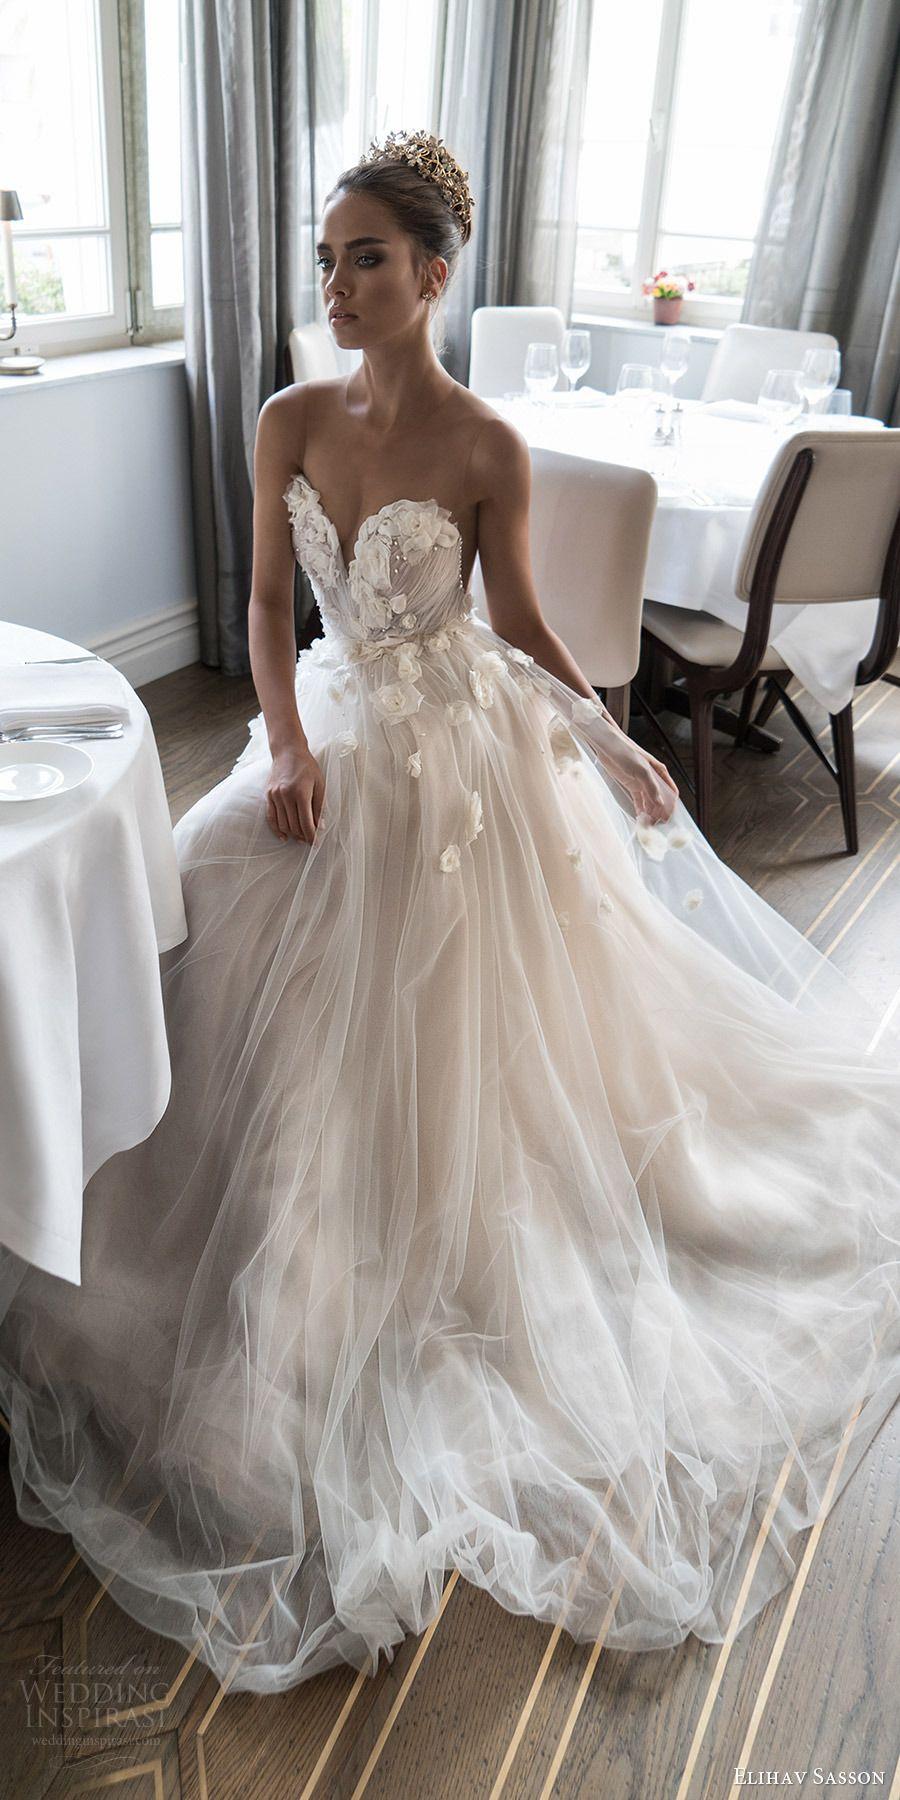 Elihav sasson wedding dresses wedding vibez in